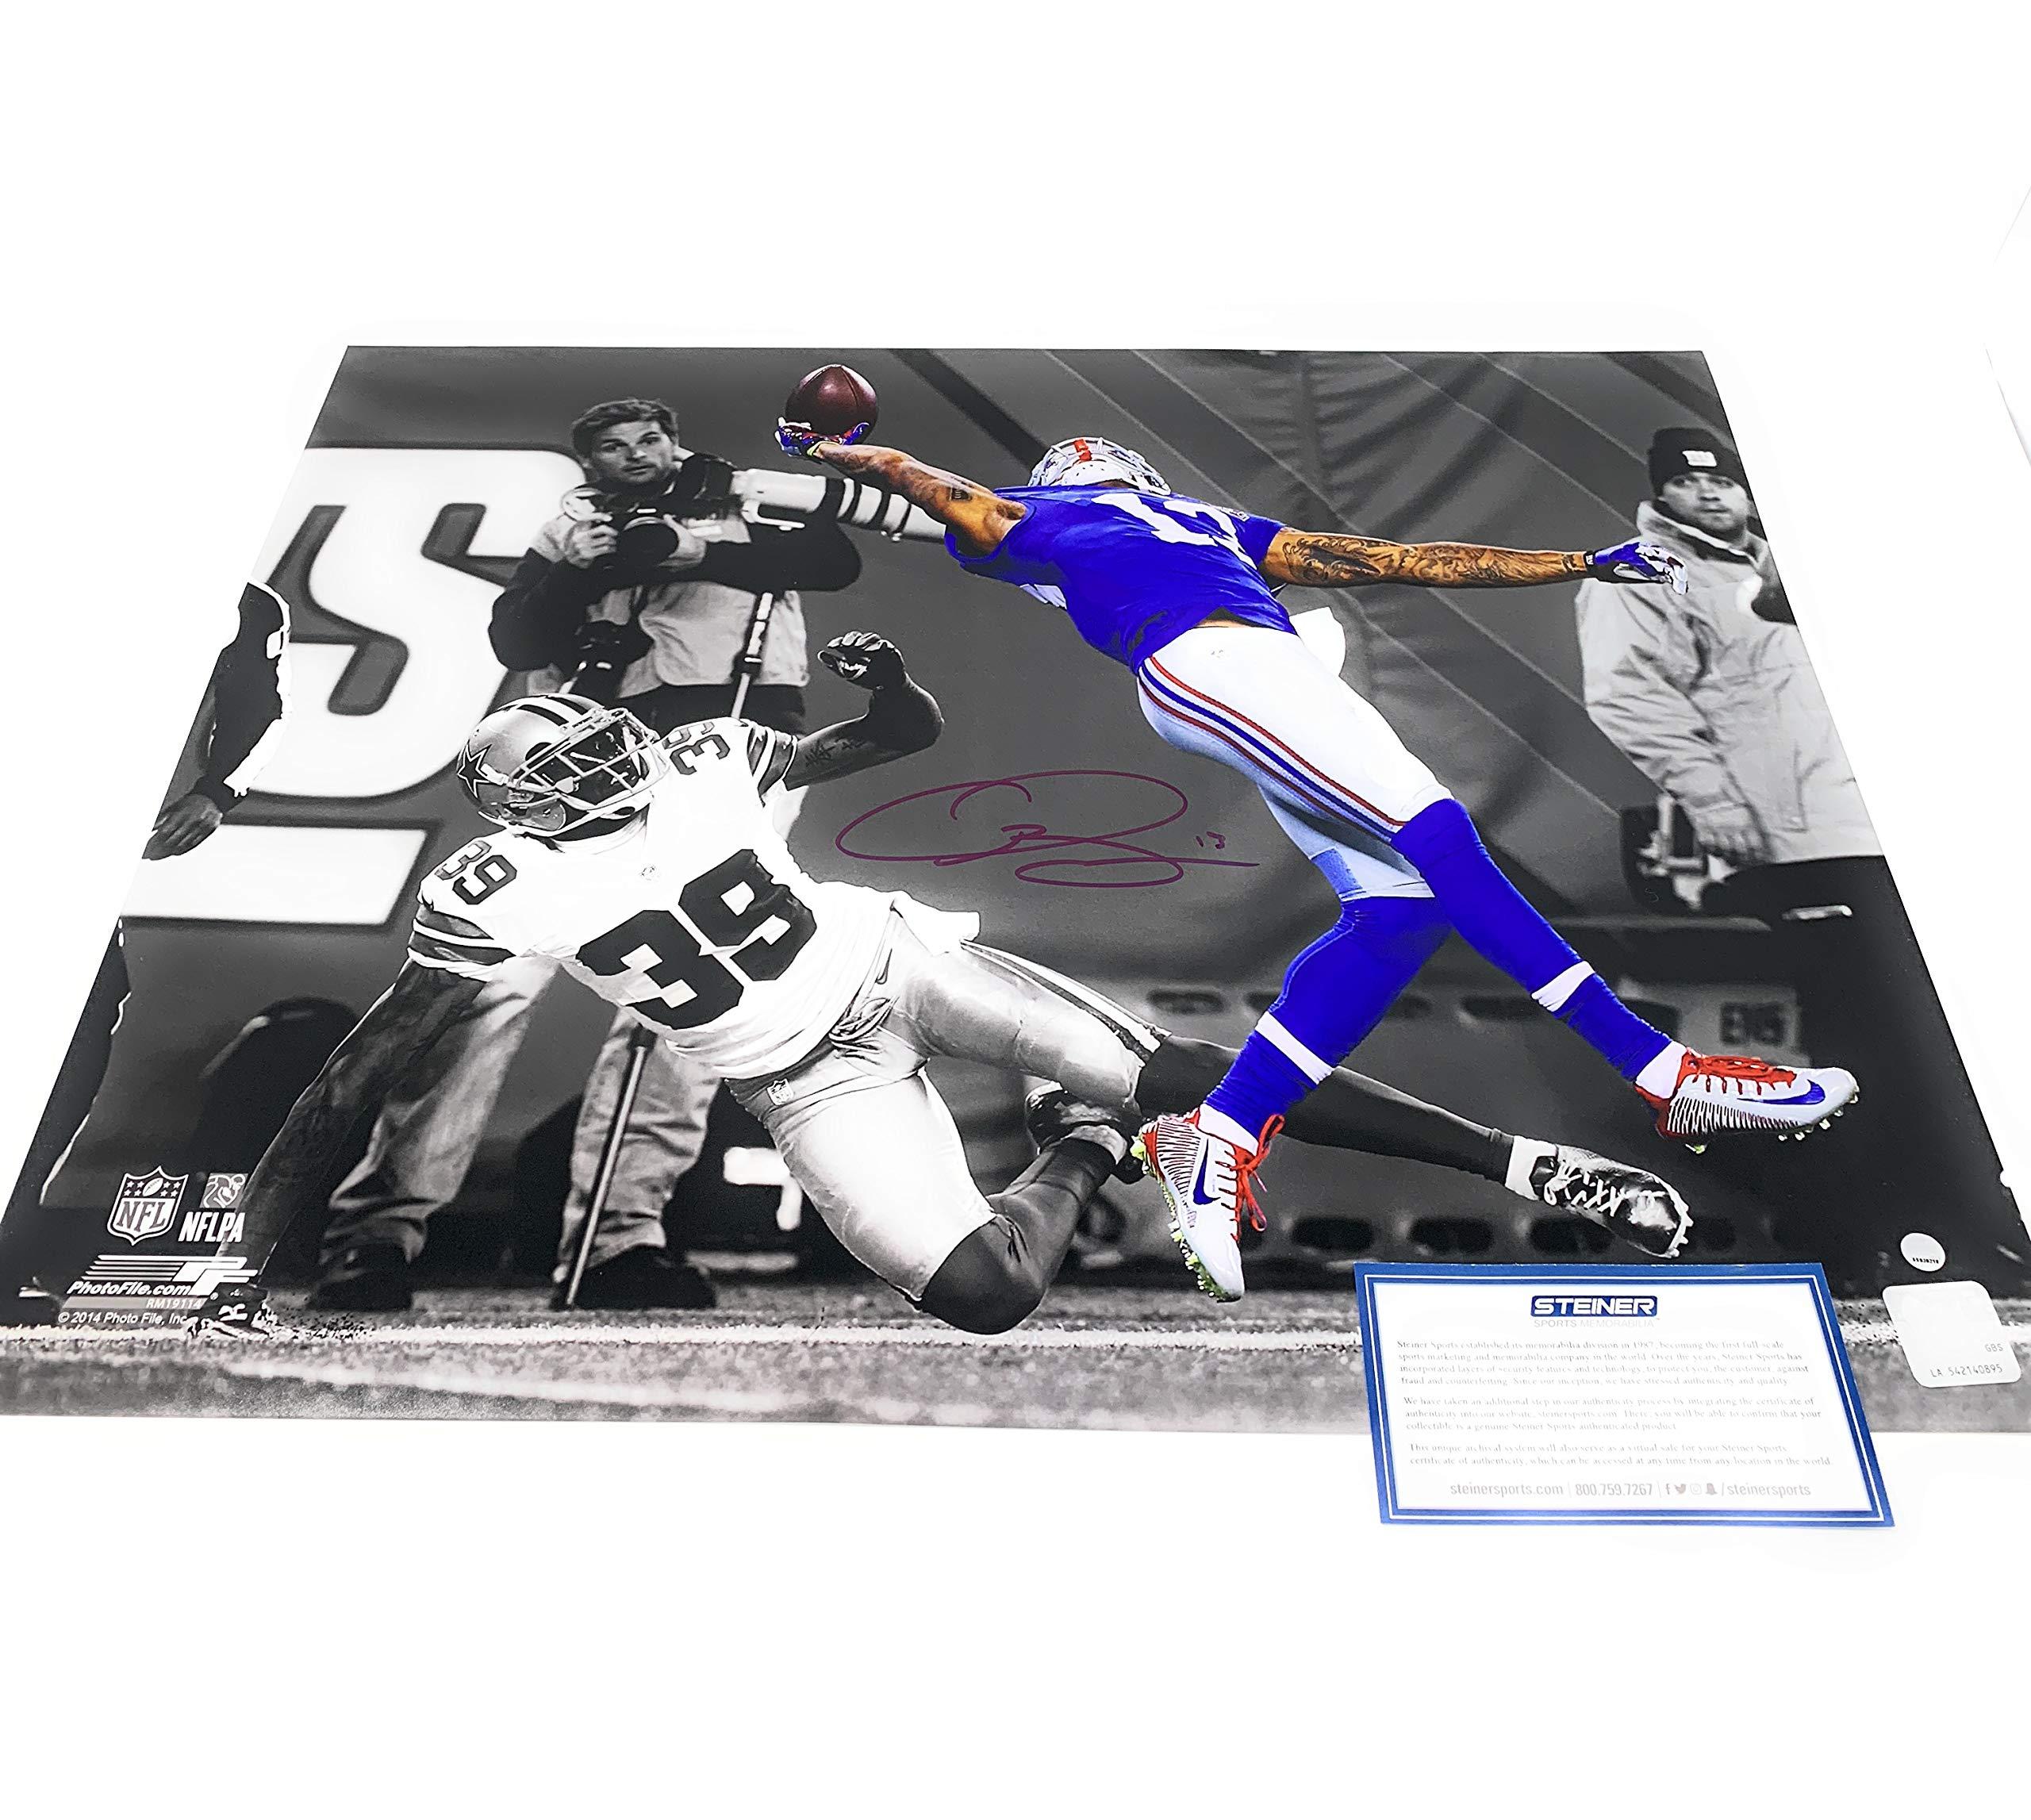 Odell Beckham Jr New York Giants Signed Autograph The Catch Spotlight 16x20 Photo Photograph Steiner Sports Certified